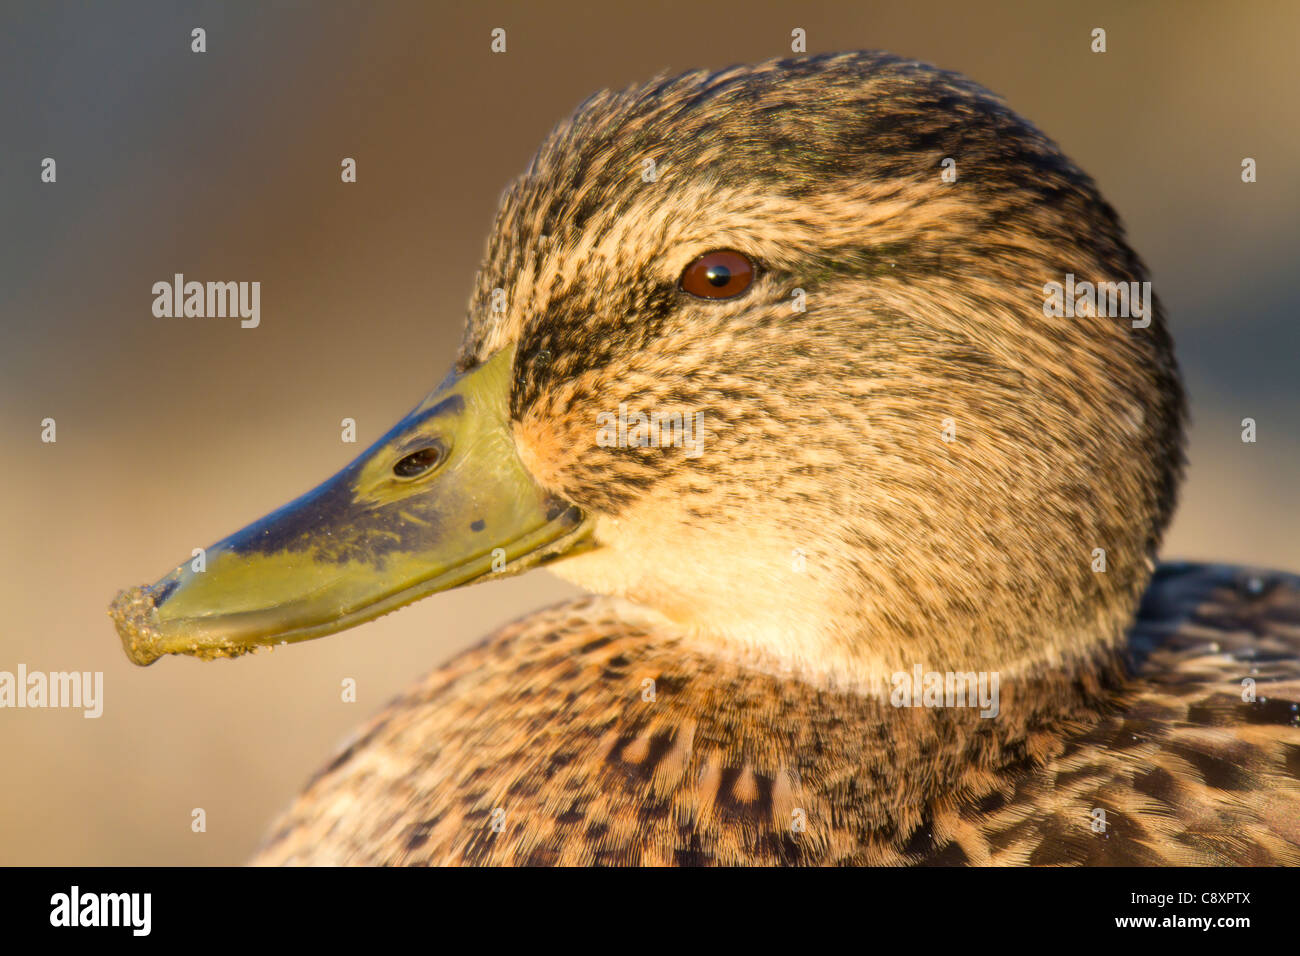 close-up of the head of a female Mallard (Anas platyrhynchos) - Stock Image